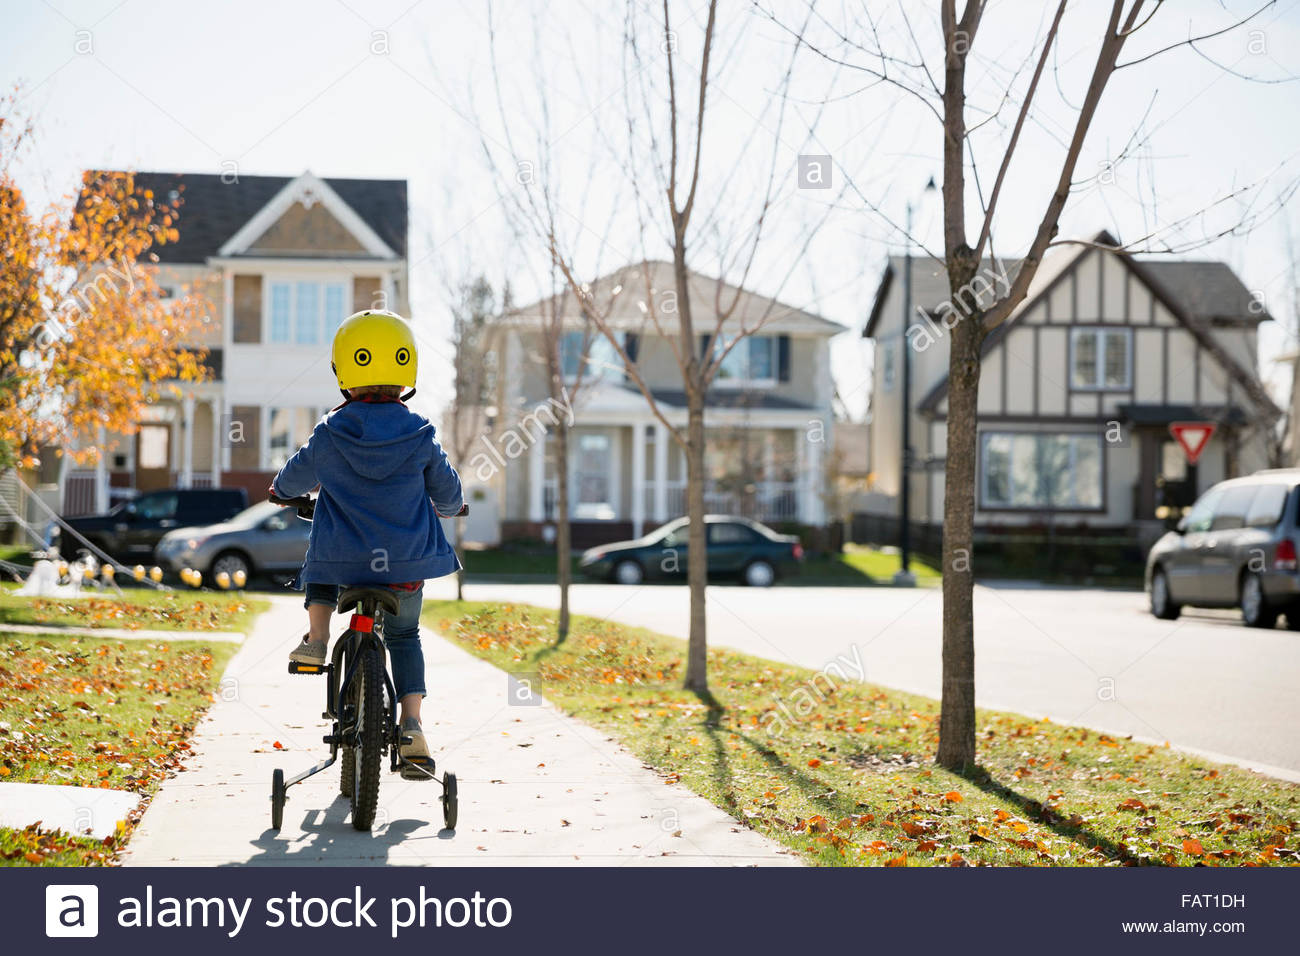 Rear view boy riding bike autumn neighborhood sidewalk - Stock Image